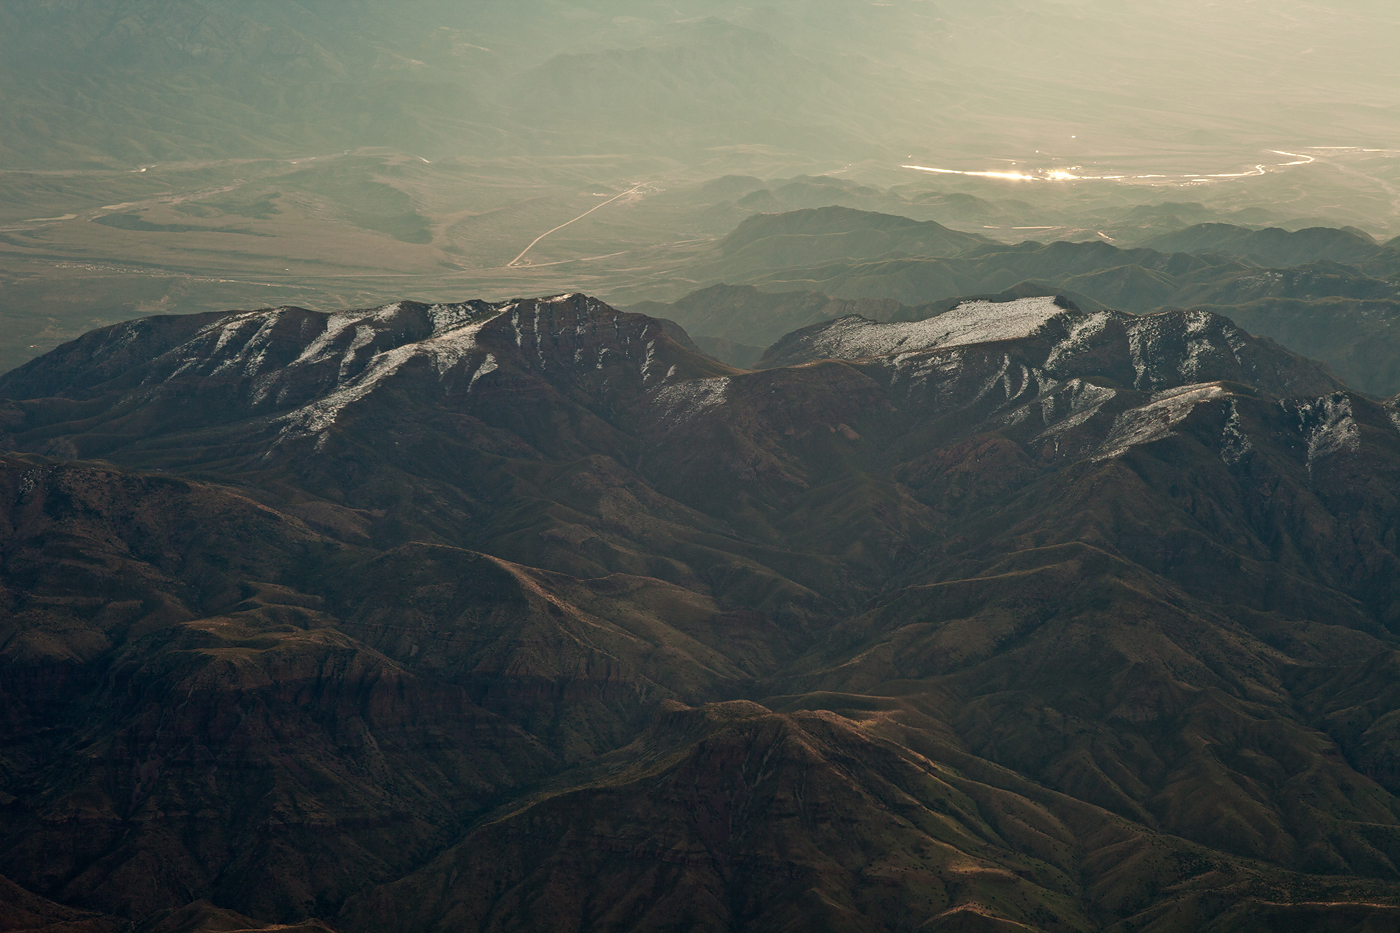 Aerialscapes